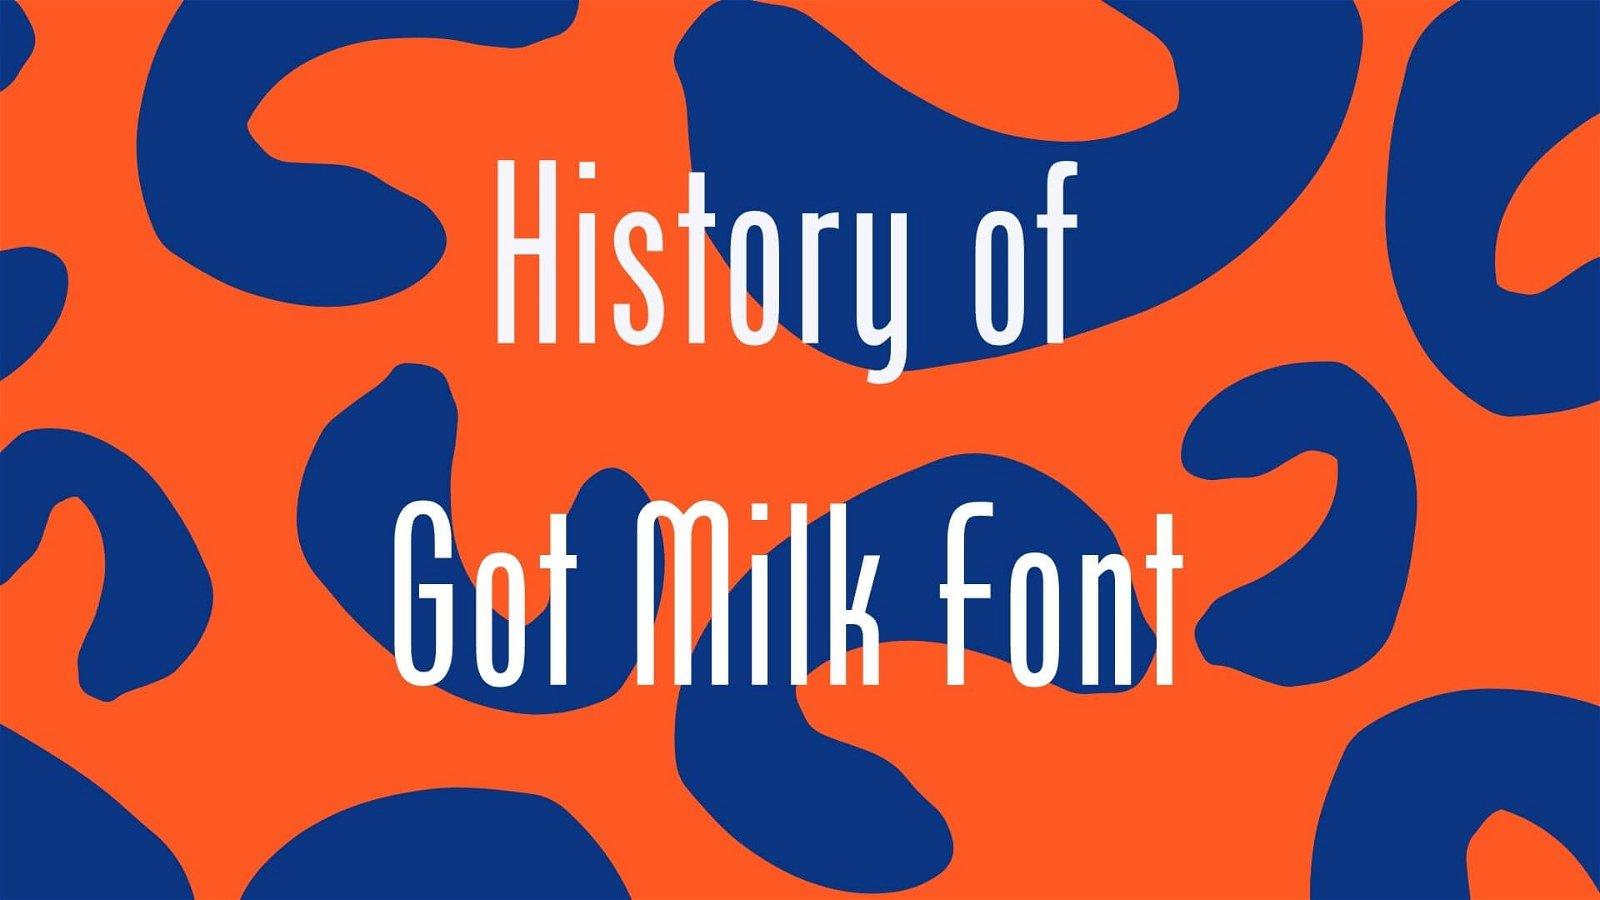 History of Got Milk Font